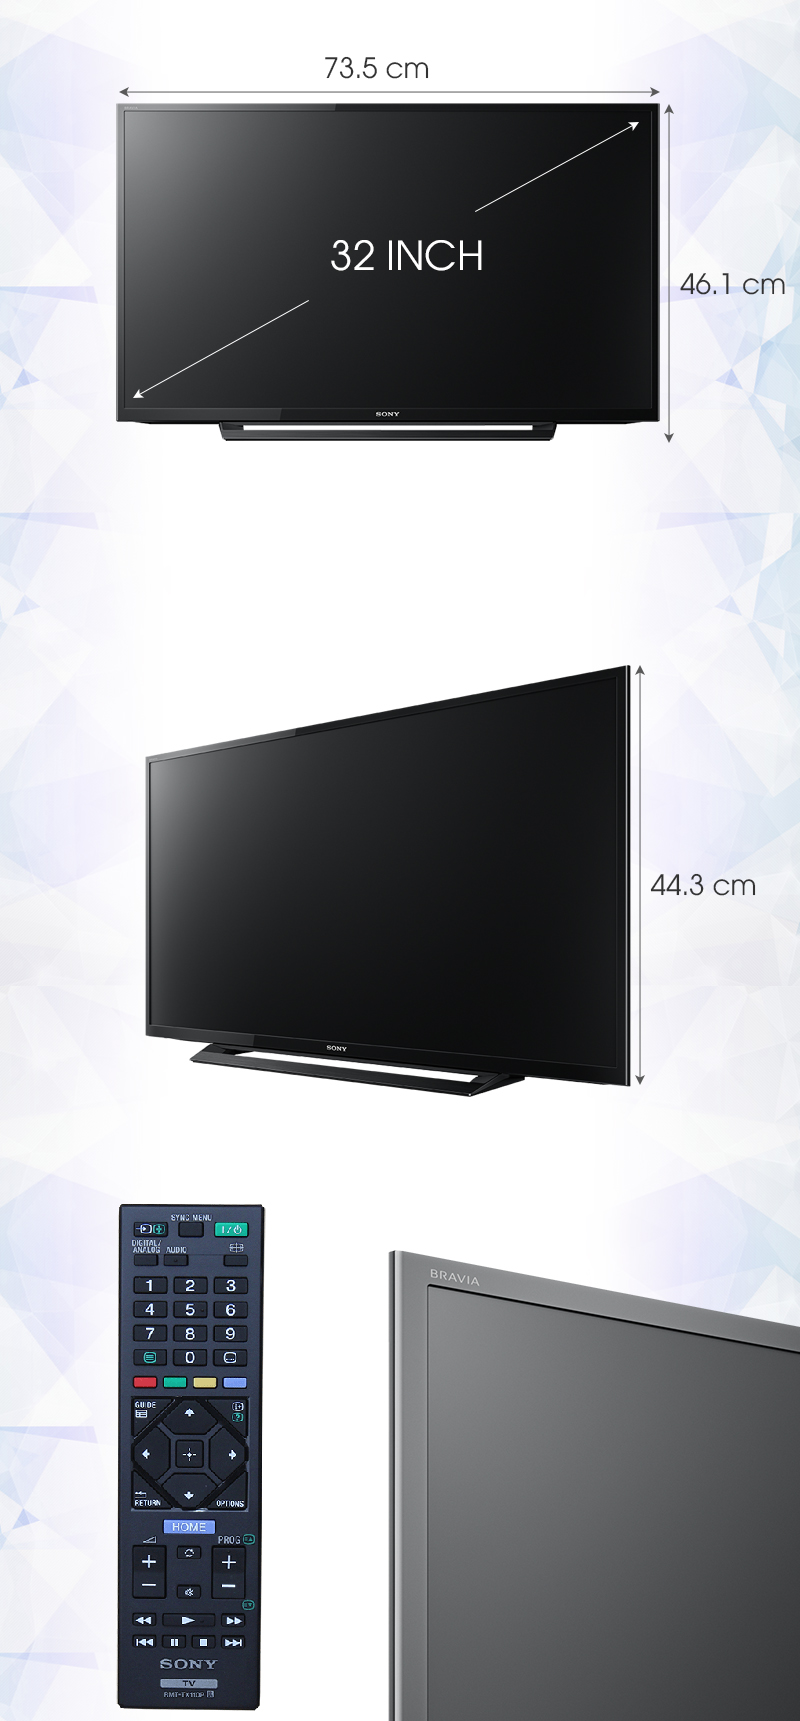 Tivi Sony 32 inch KDL-32R300D - Kích thước tivi